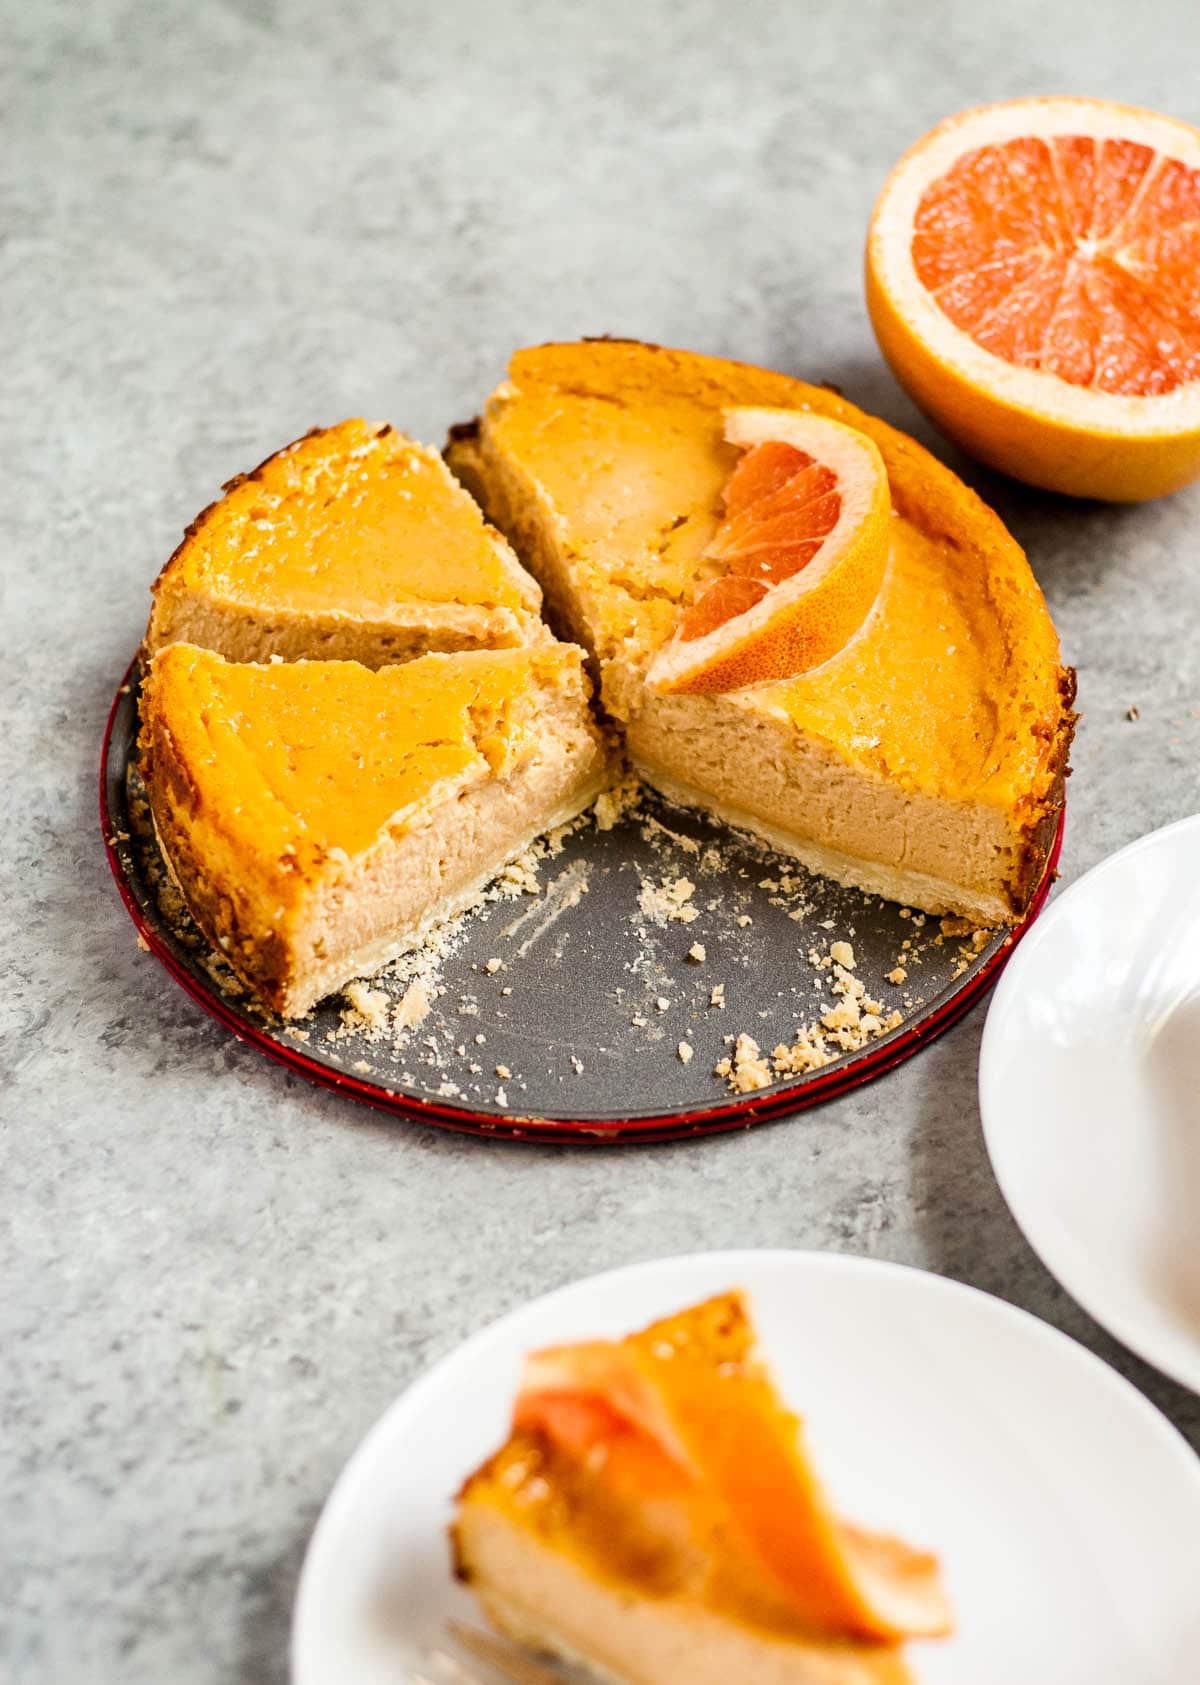 grapefruit cheesecake on plate